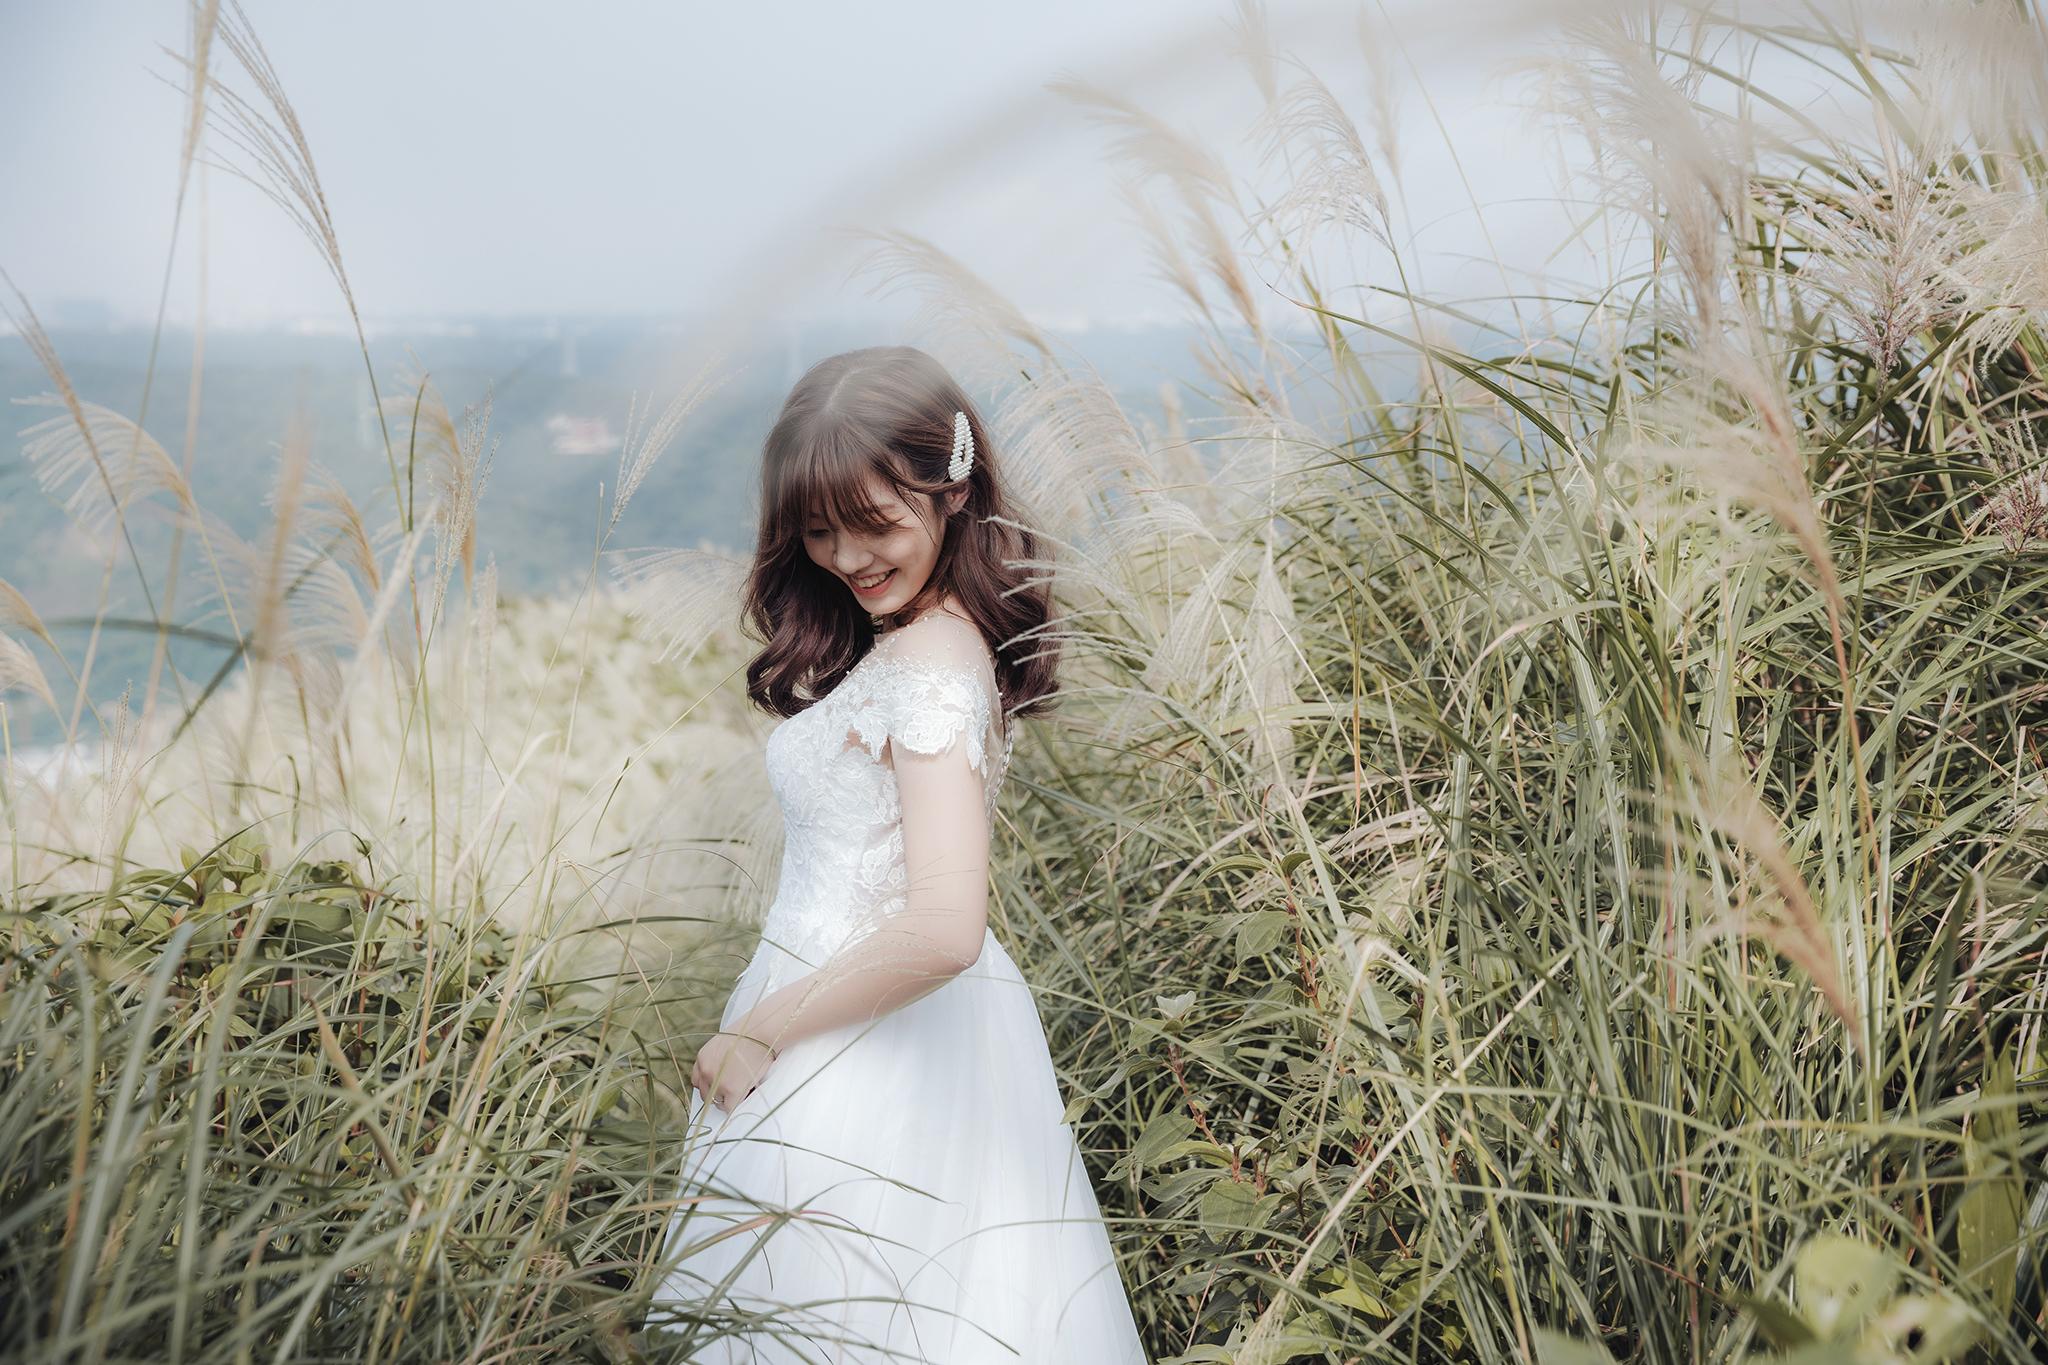 50697238201 dfaeafe5ee o - 【自主婚紗】+凱婷+